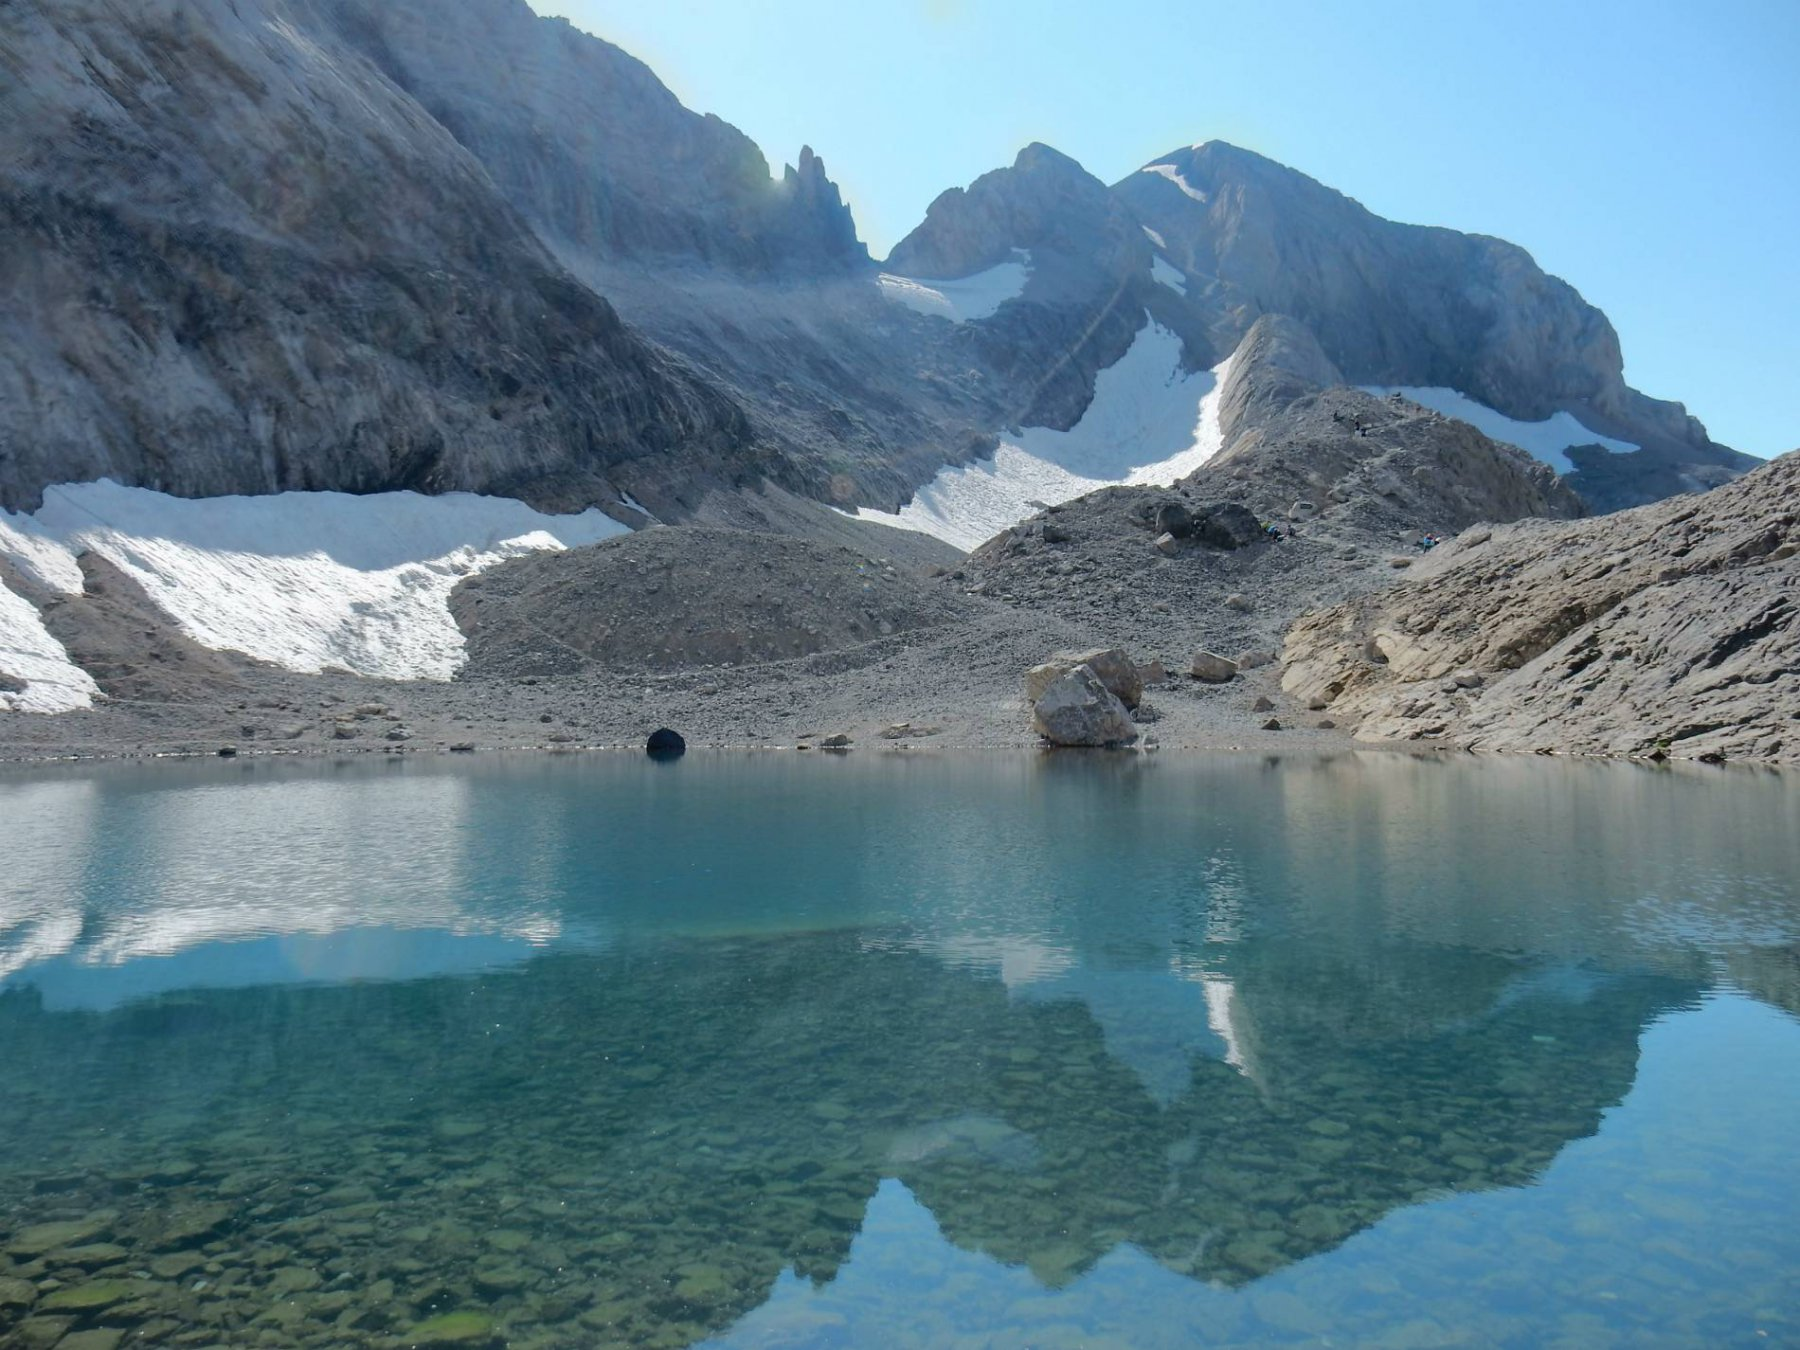 Lago Helado 2990mt. e M.Perdido 3355mt.